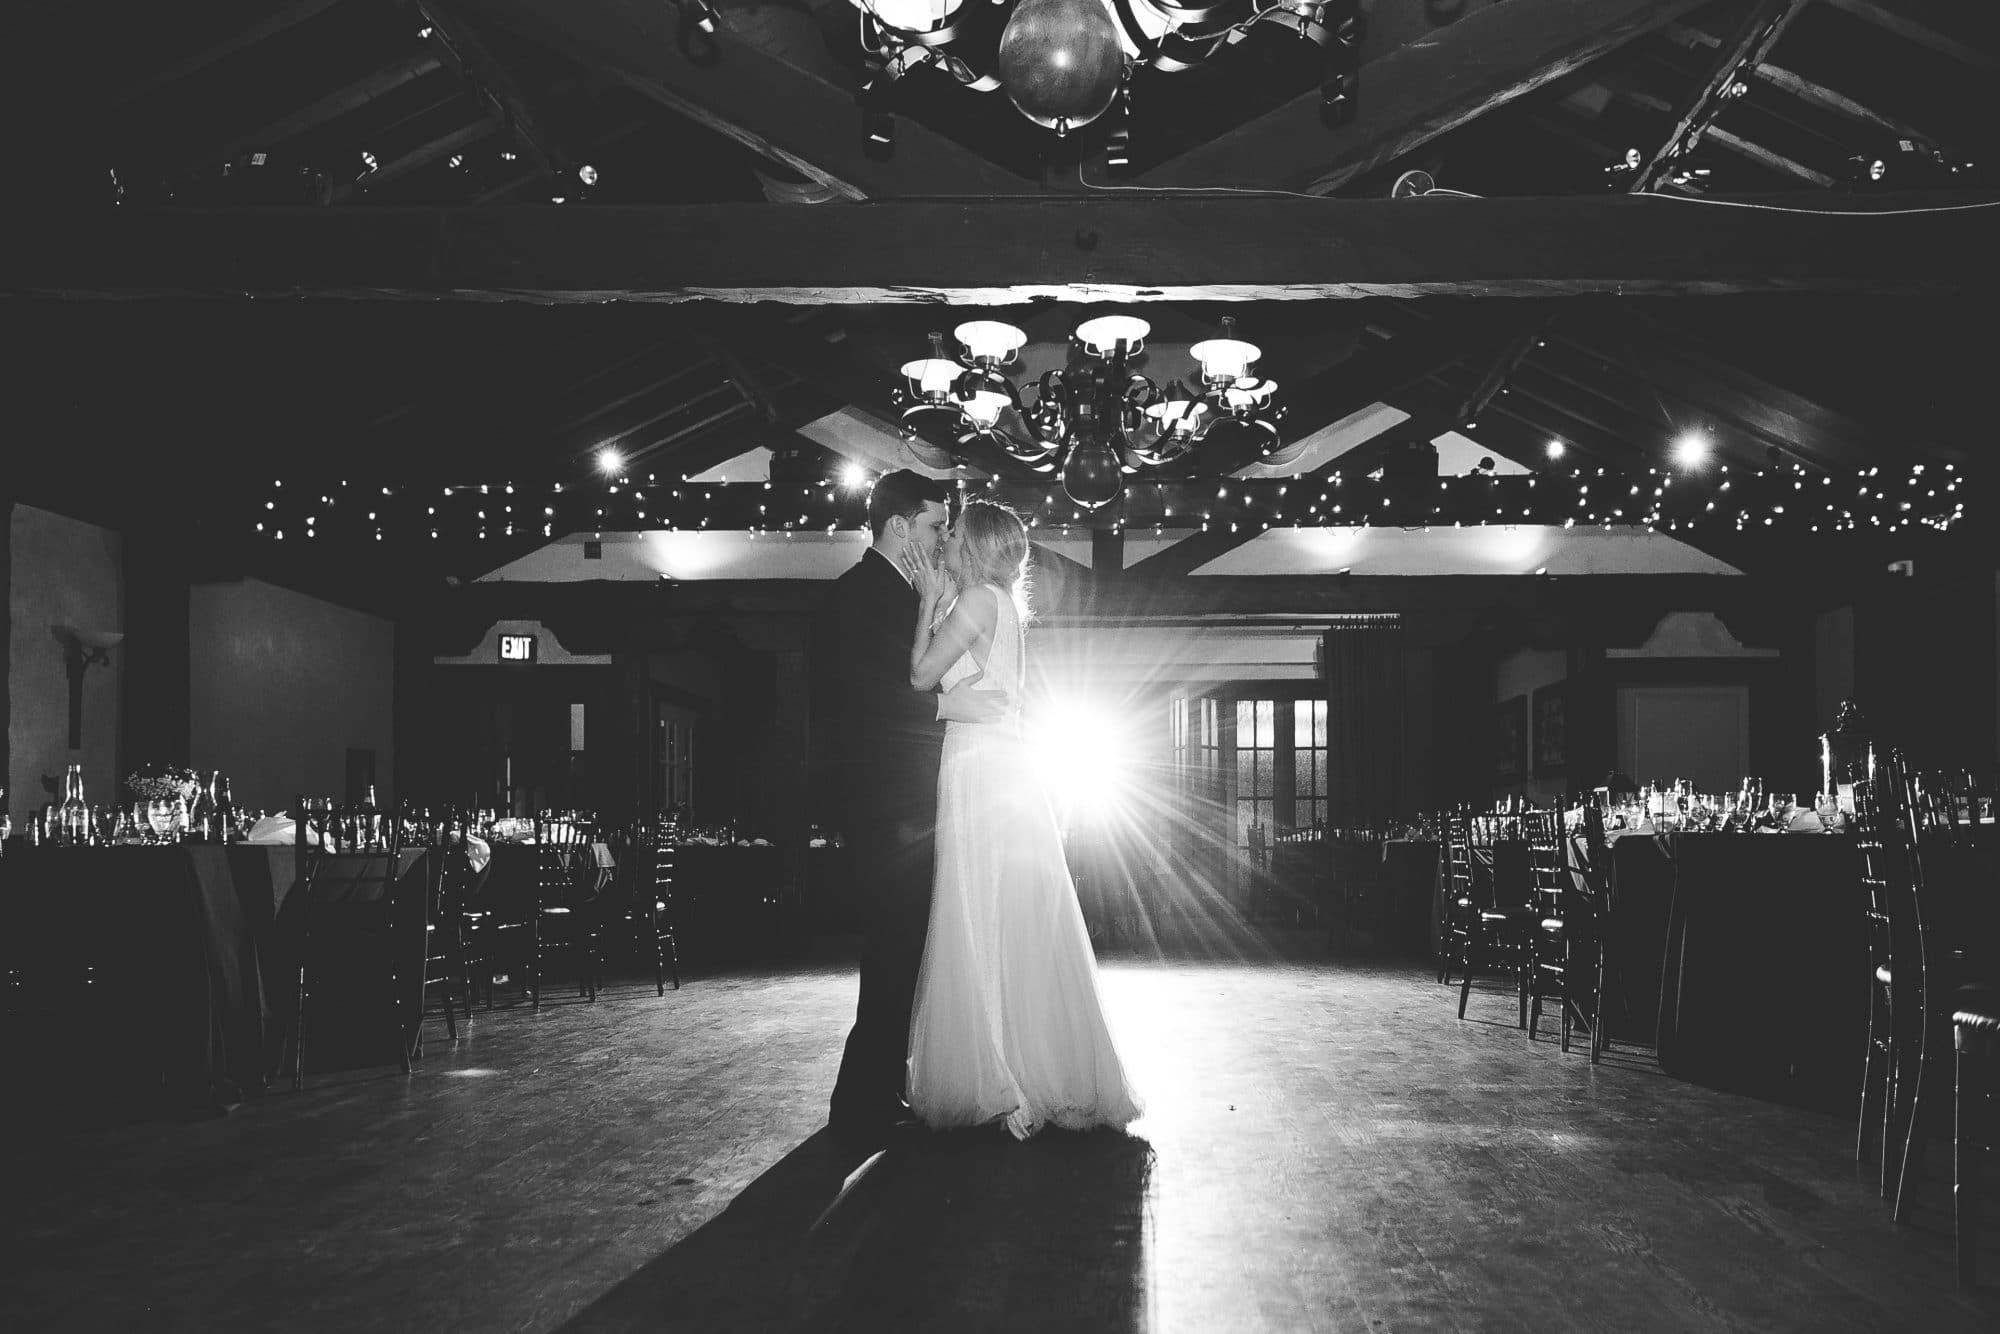 Rachel Doyle Photography - bride and groom slow dancing in empty reception room